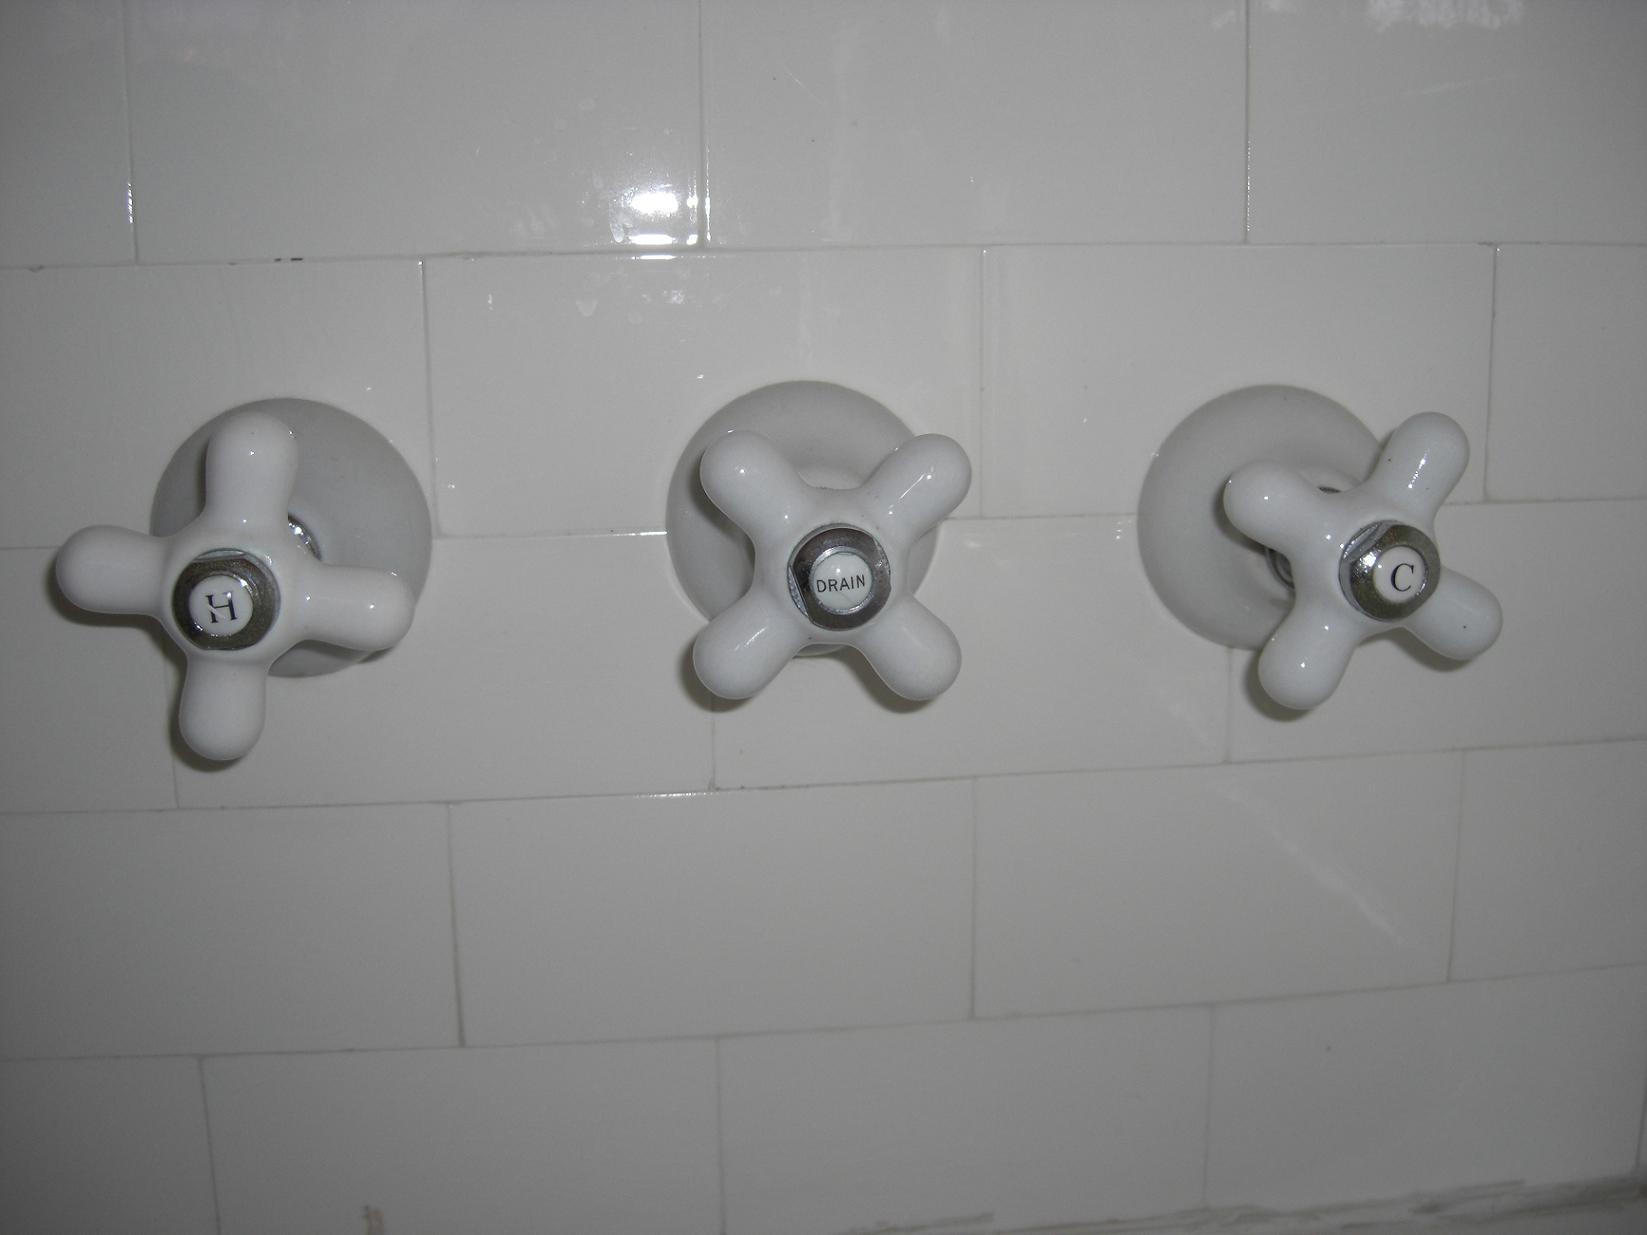 Need help with slow draining bathtub-tubcontrols.jpg